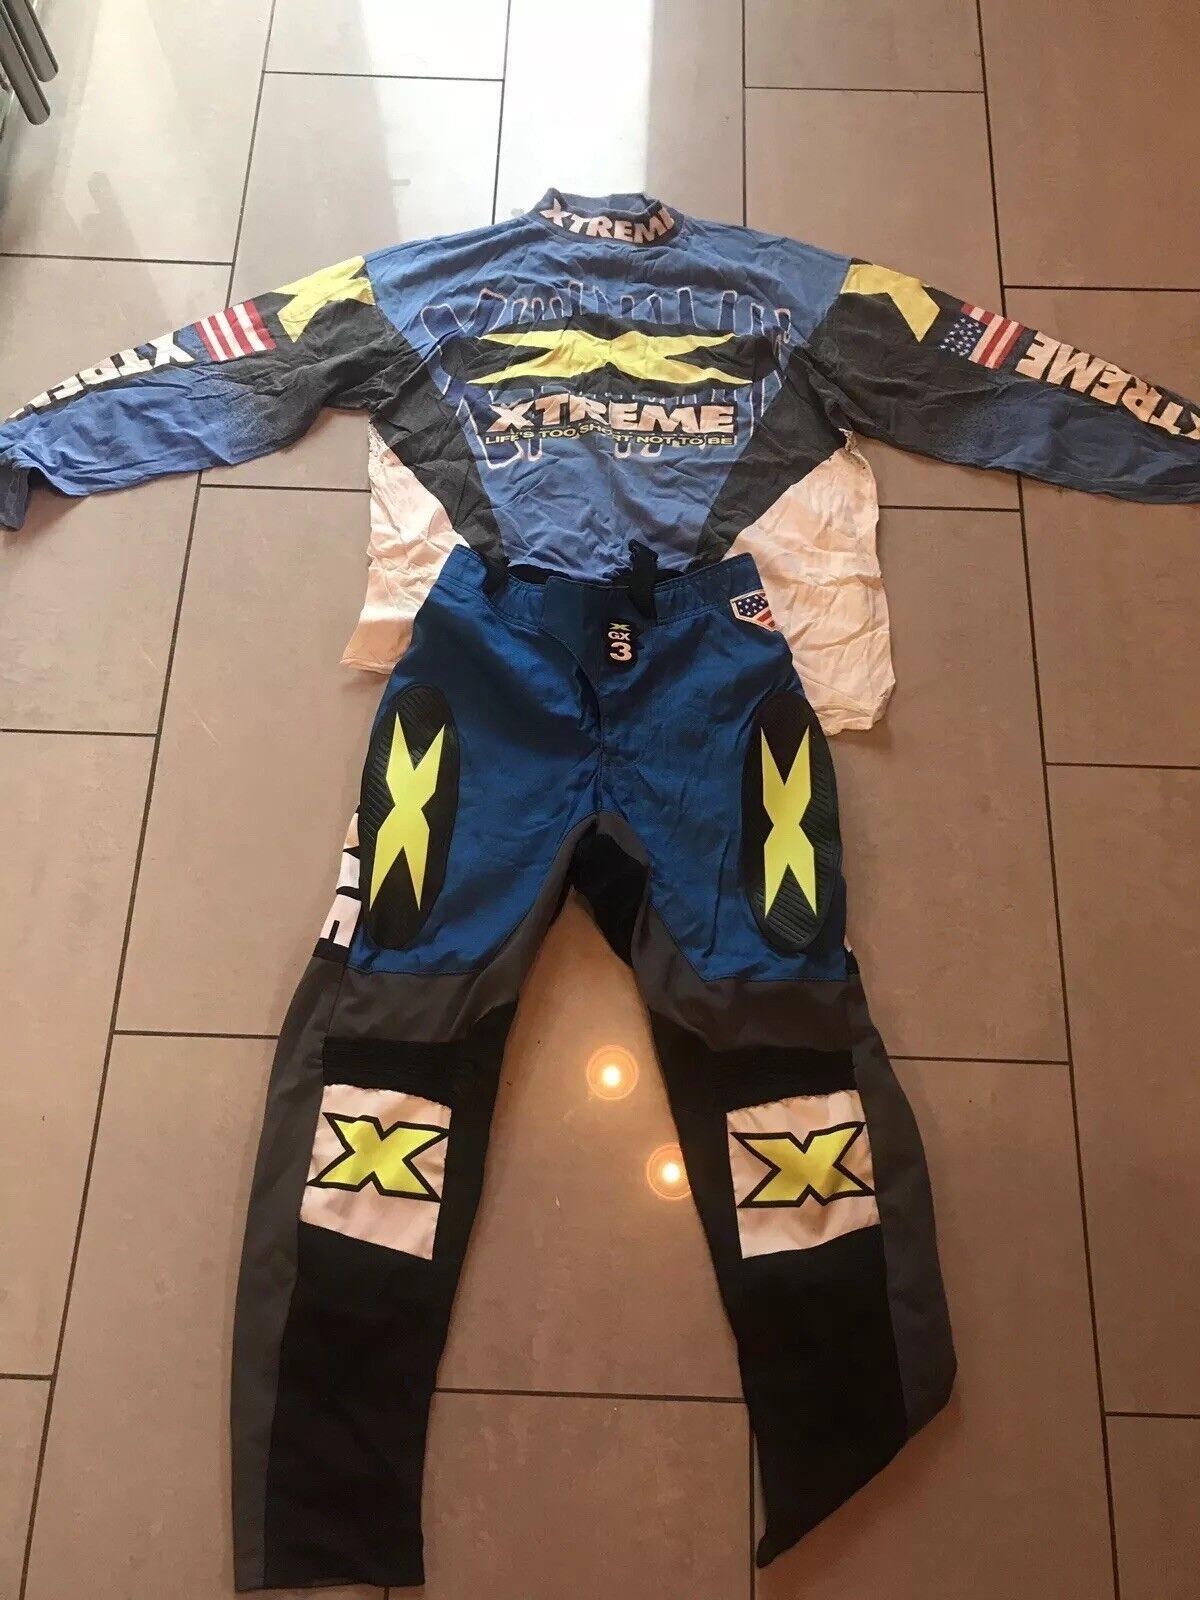 Xtreme  Evo Motocross Clothing Vintage  10 days return